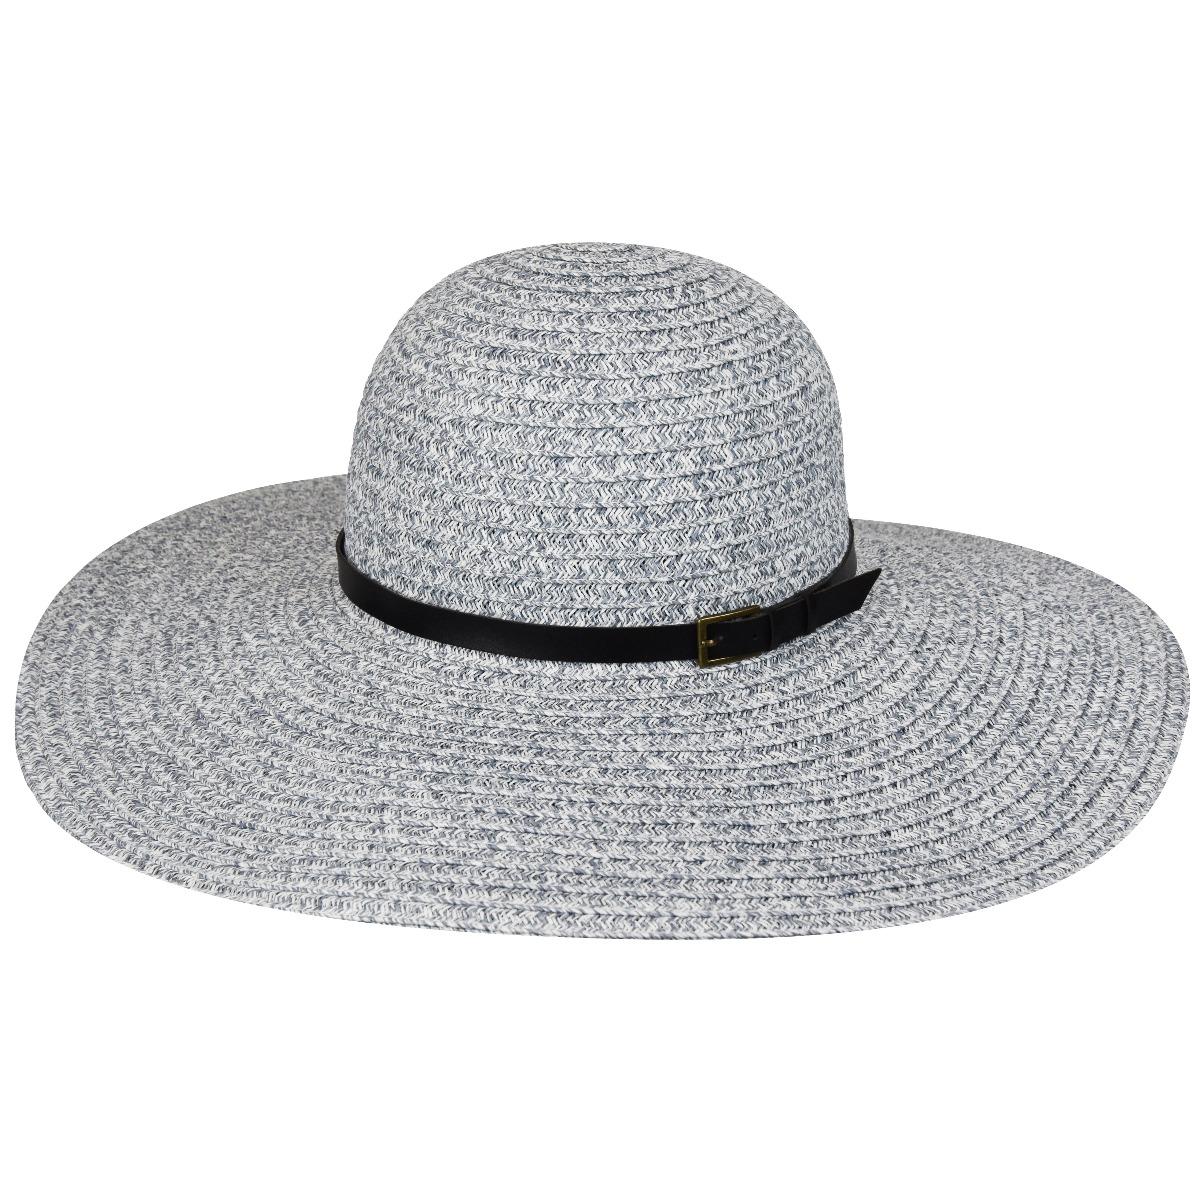 Betmar Ramona Braid Floppy Hat in Light Grey Multi